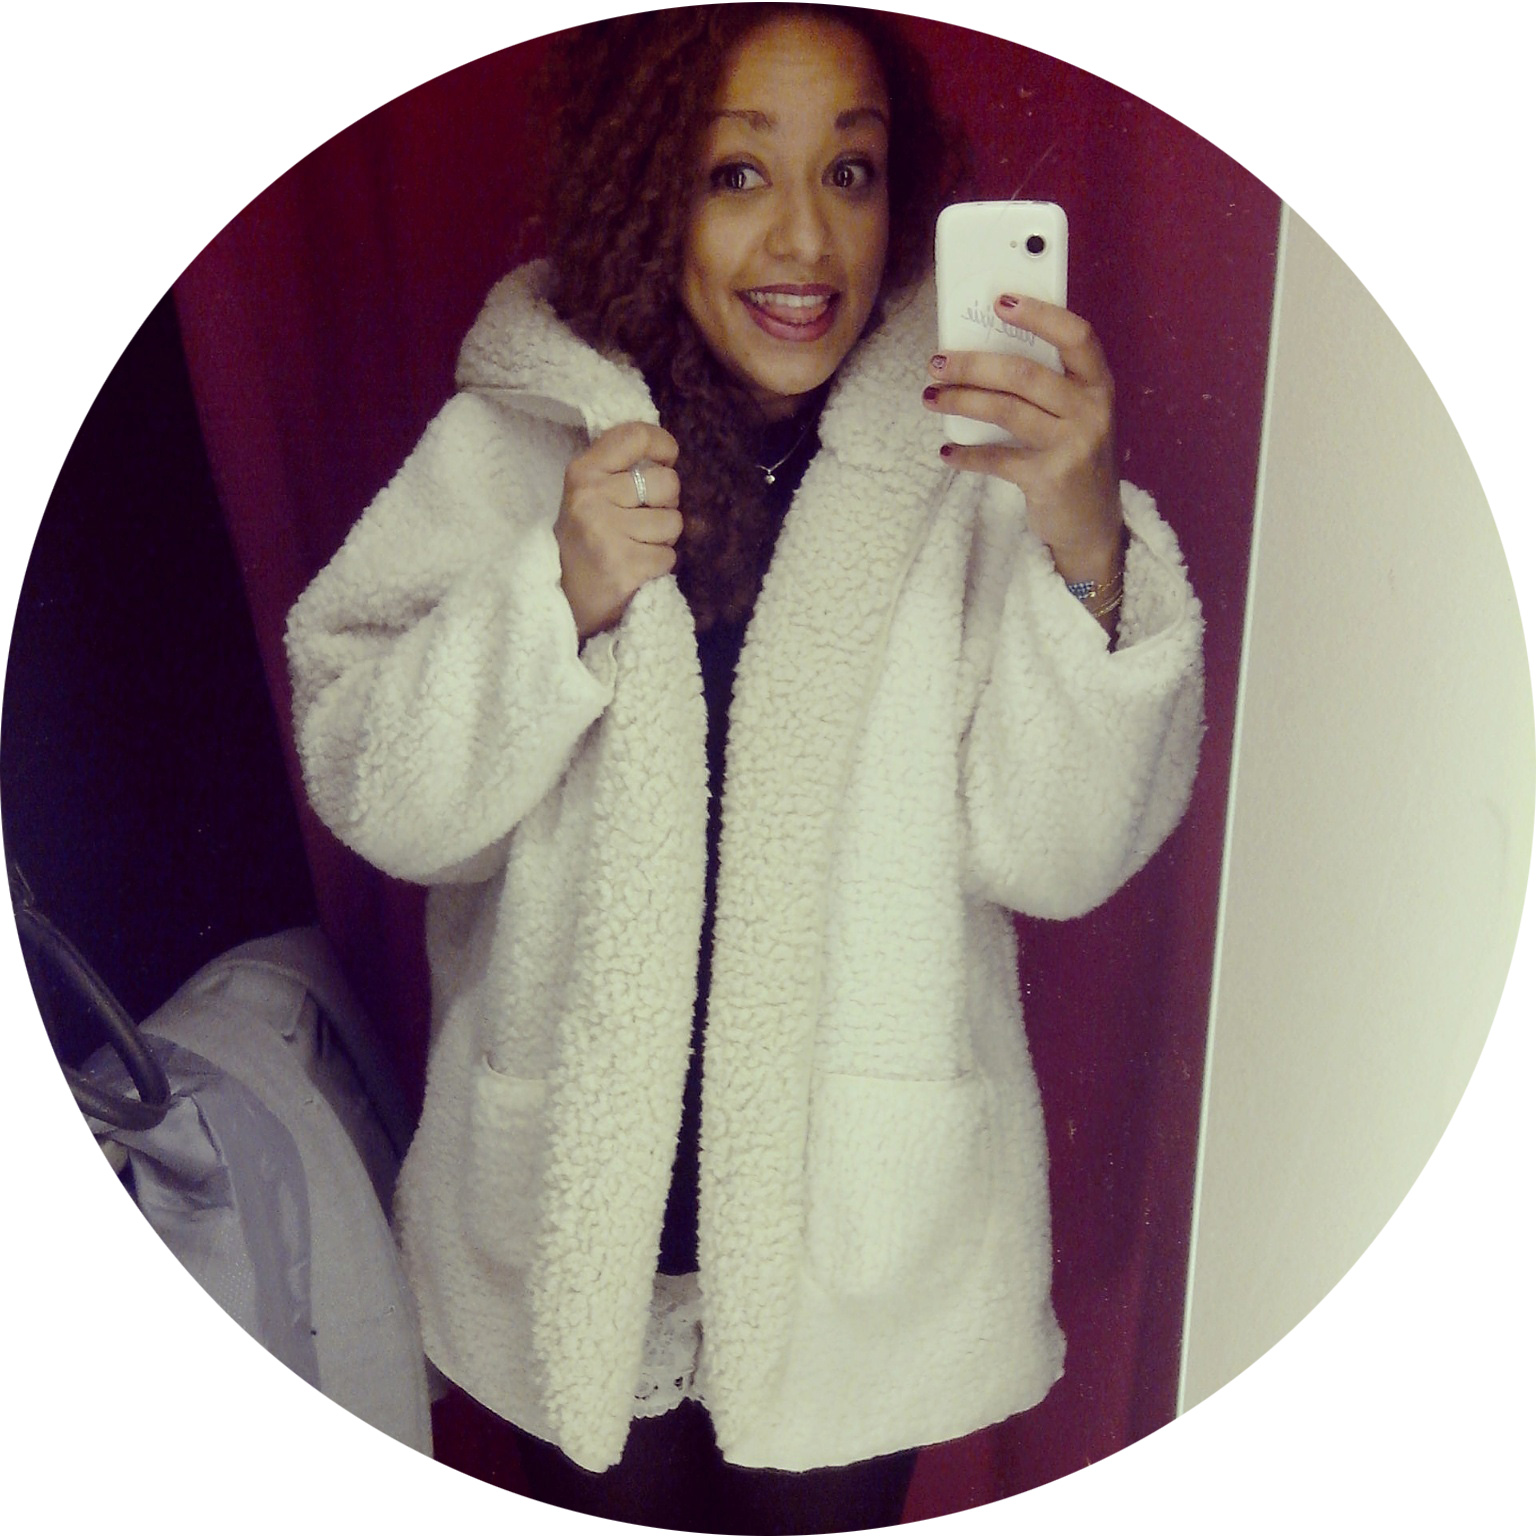 ELLEMIXE_Manon_profil